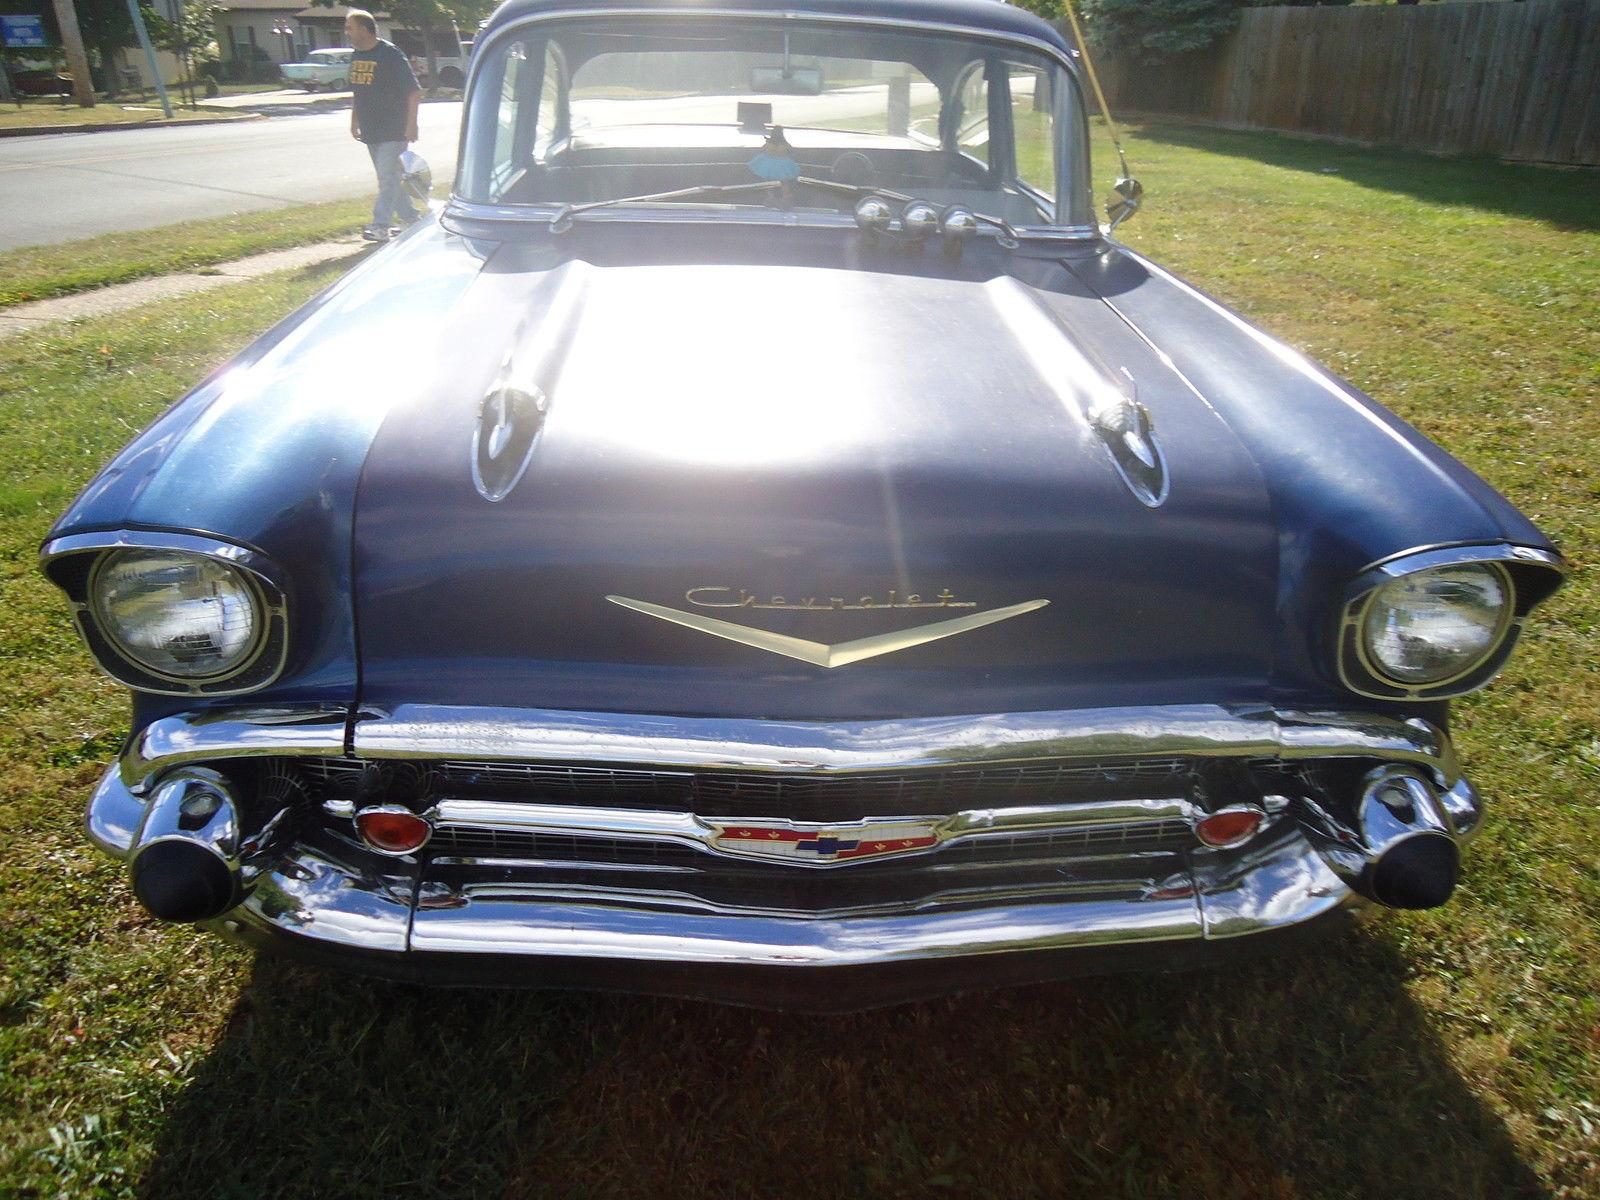 1957 chevrolet bel air 2 door post coupe chevy driver rat. Black Bedroom Furniture Sets. Home Design Ideas